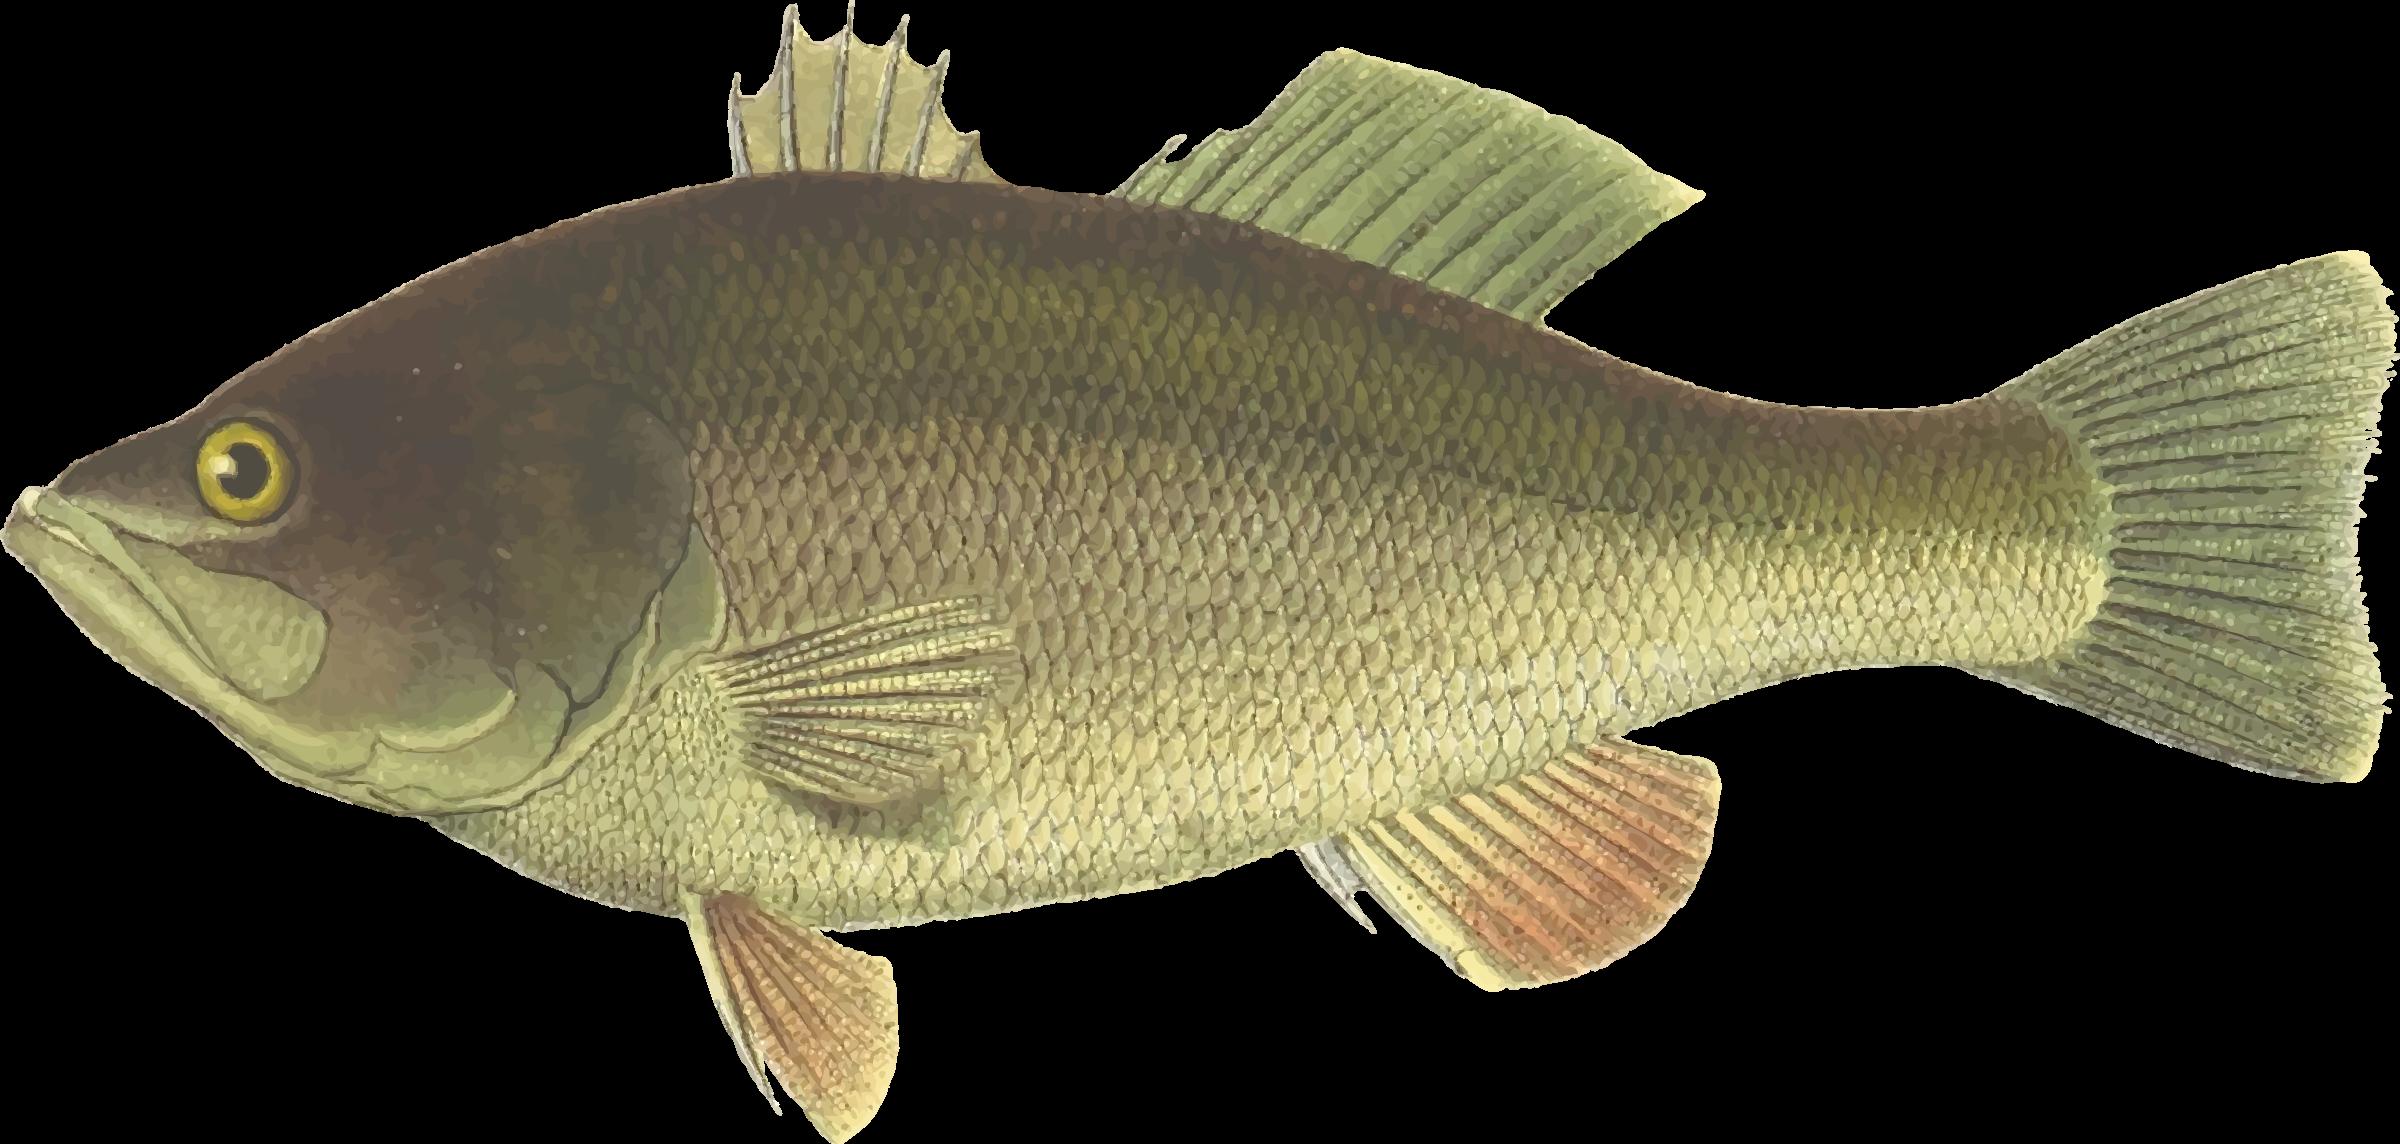 Black big image png. Fish clipart bass